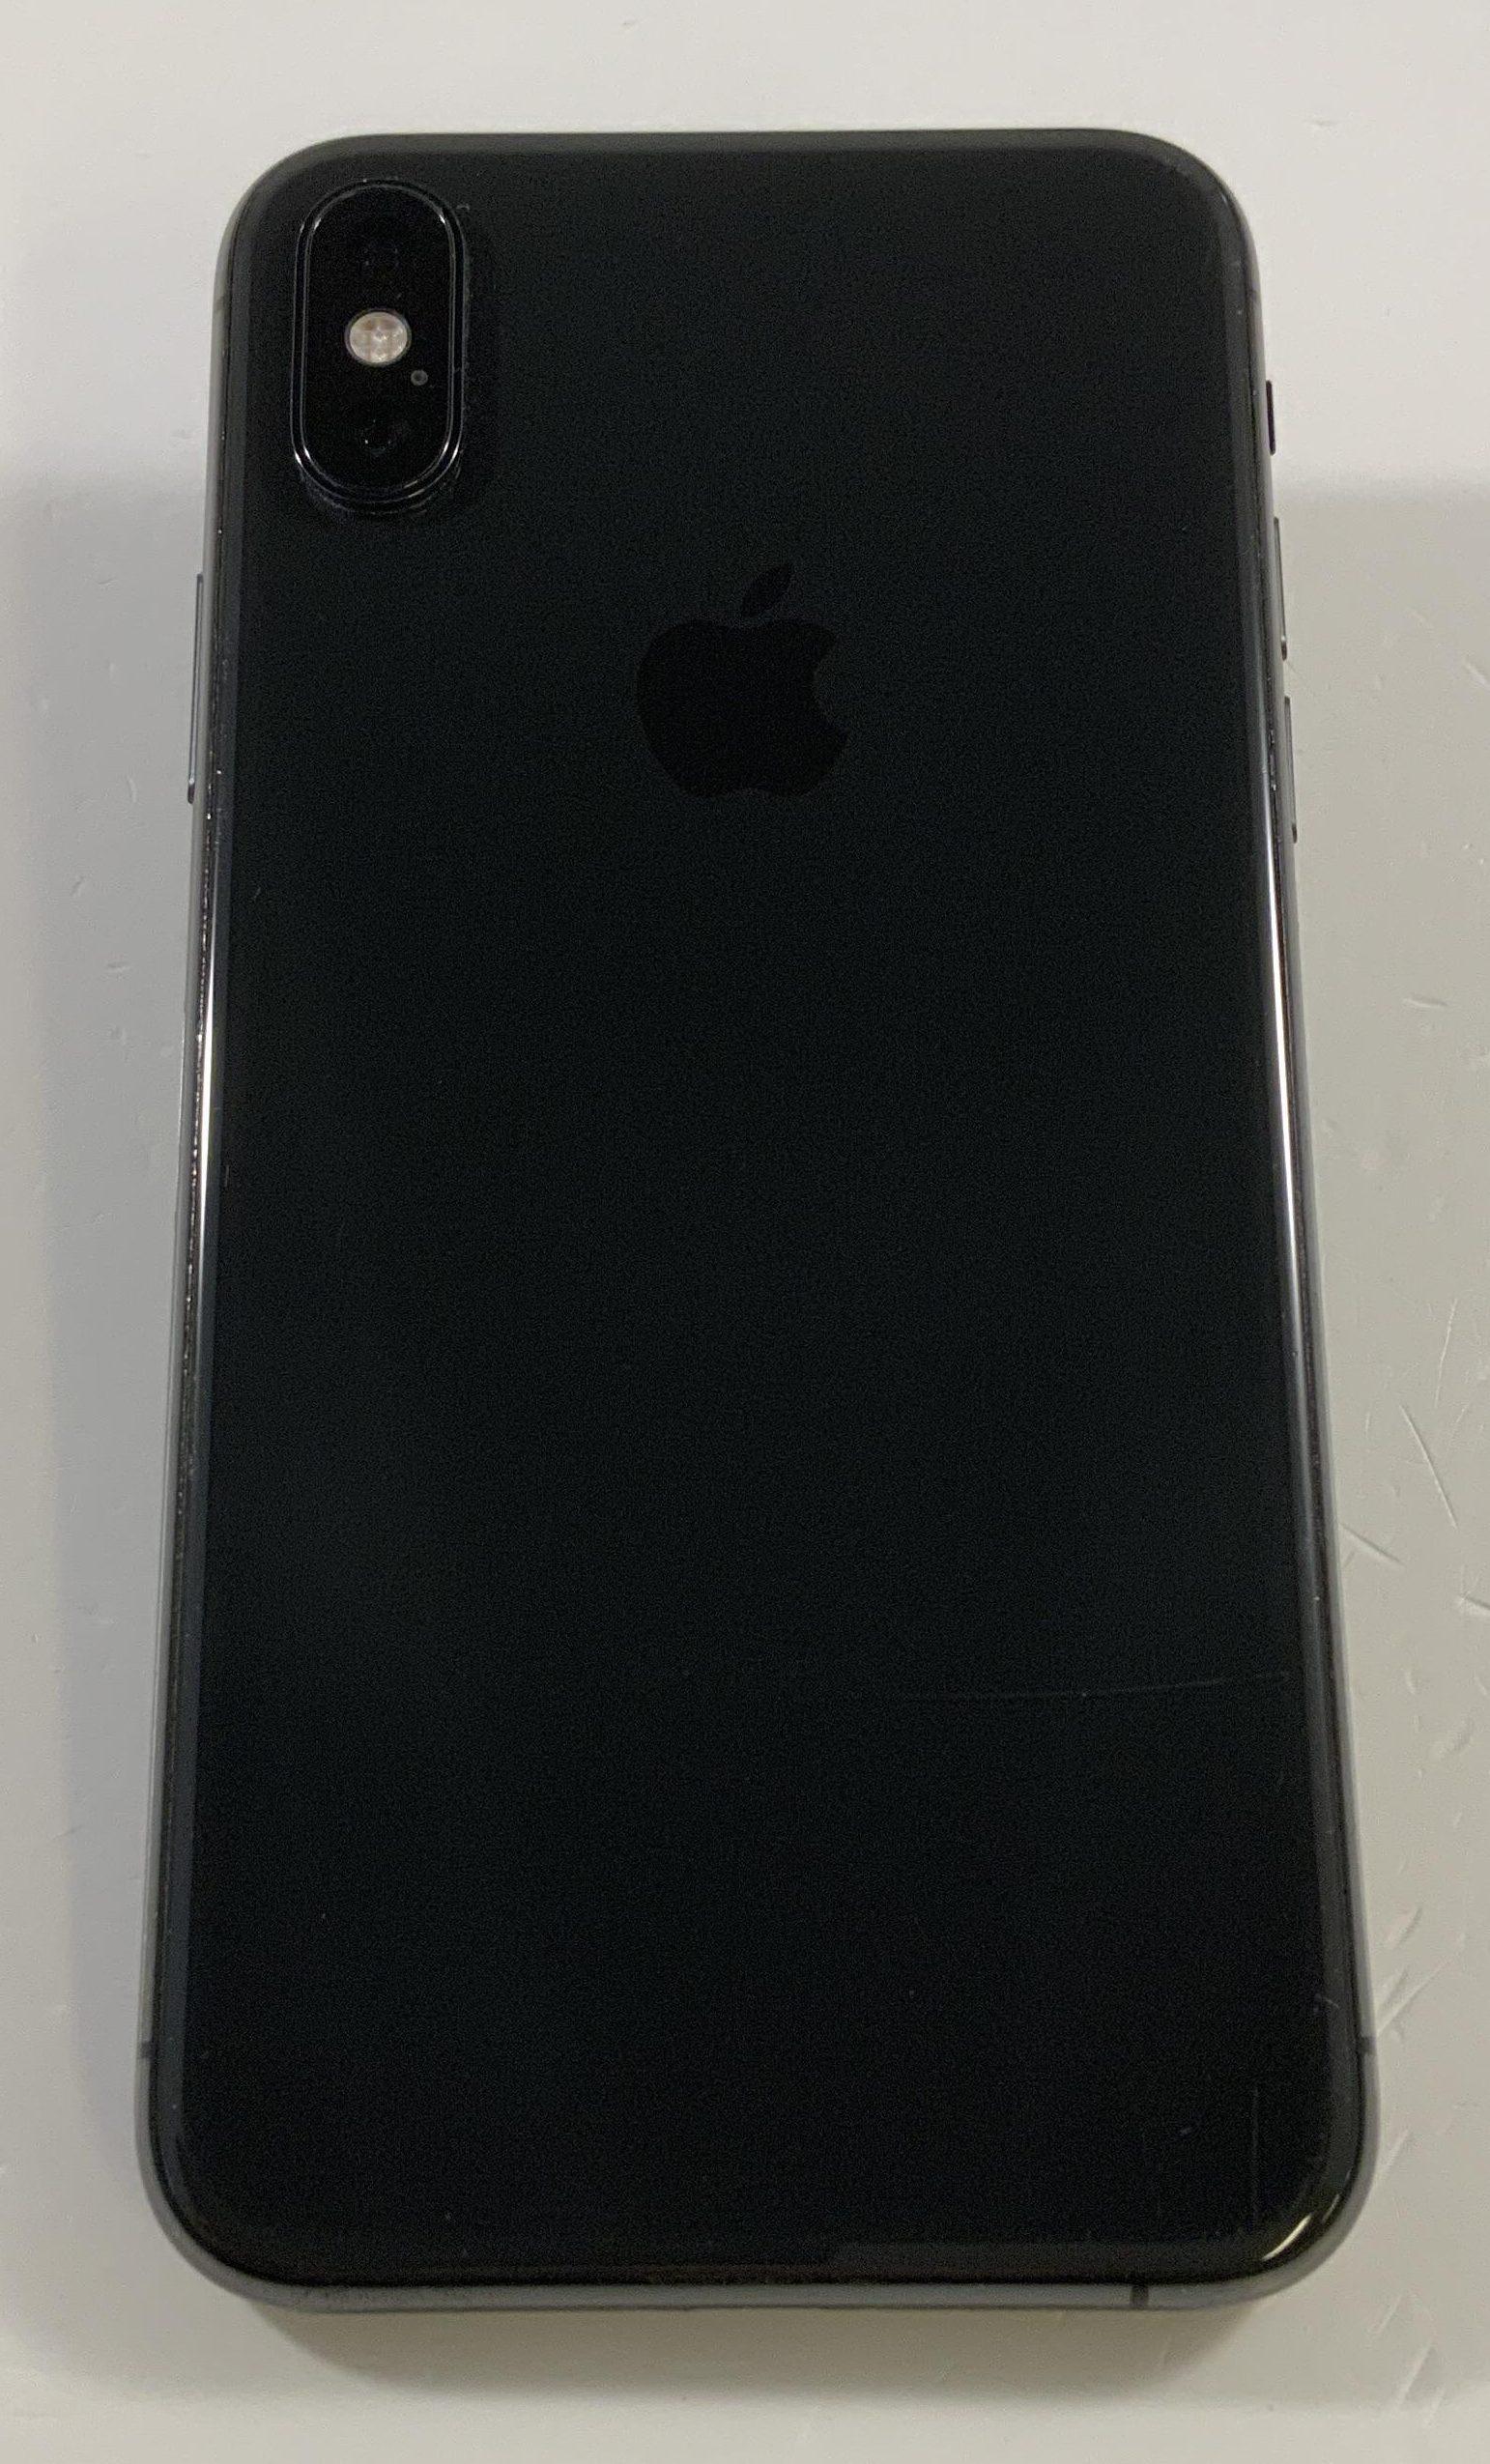 iPhone XS 64GB, 64GB, Space Gray, imagen 2